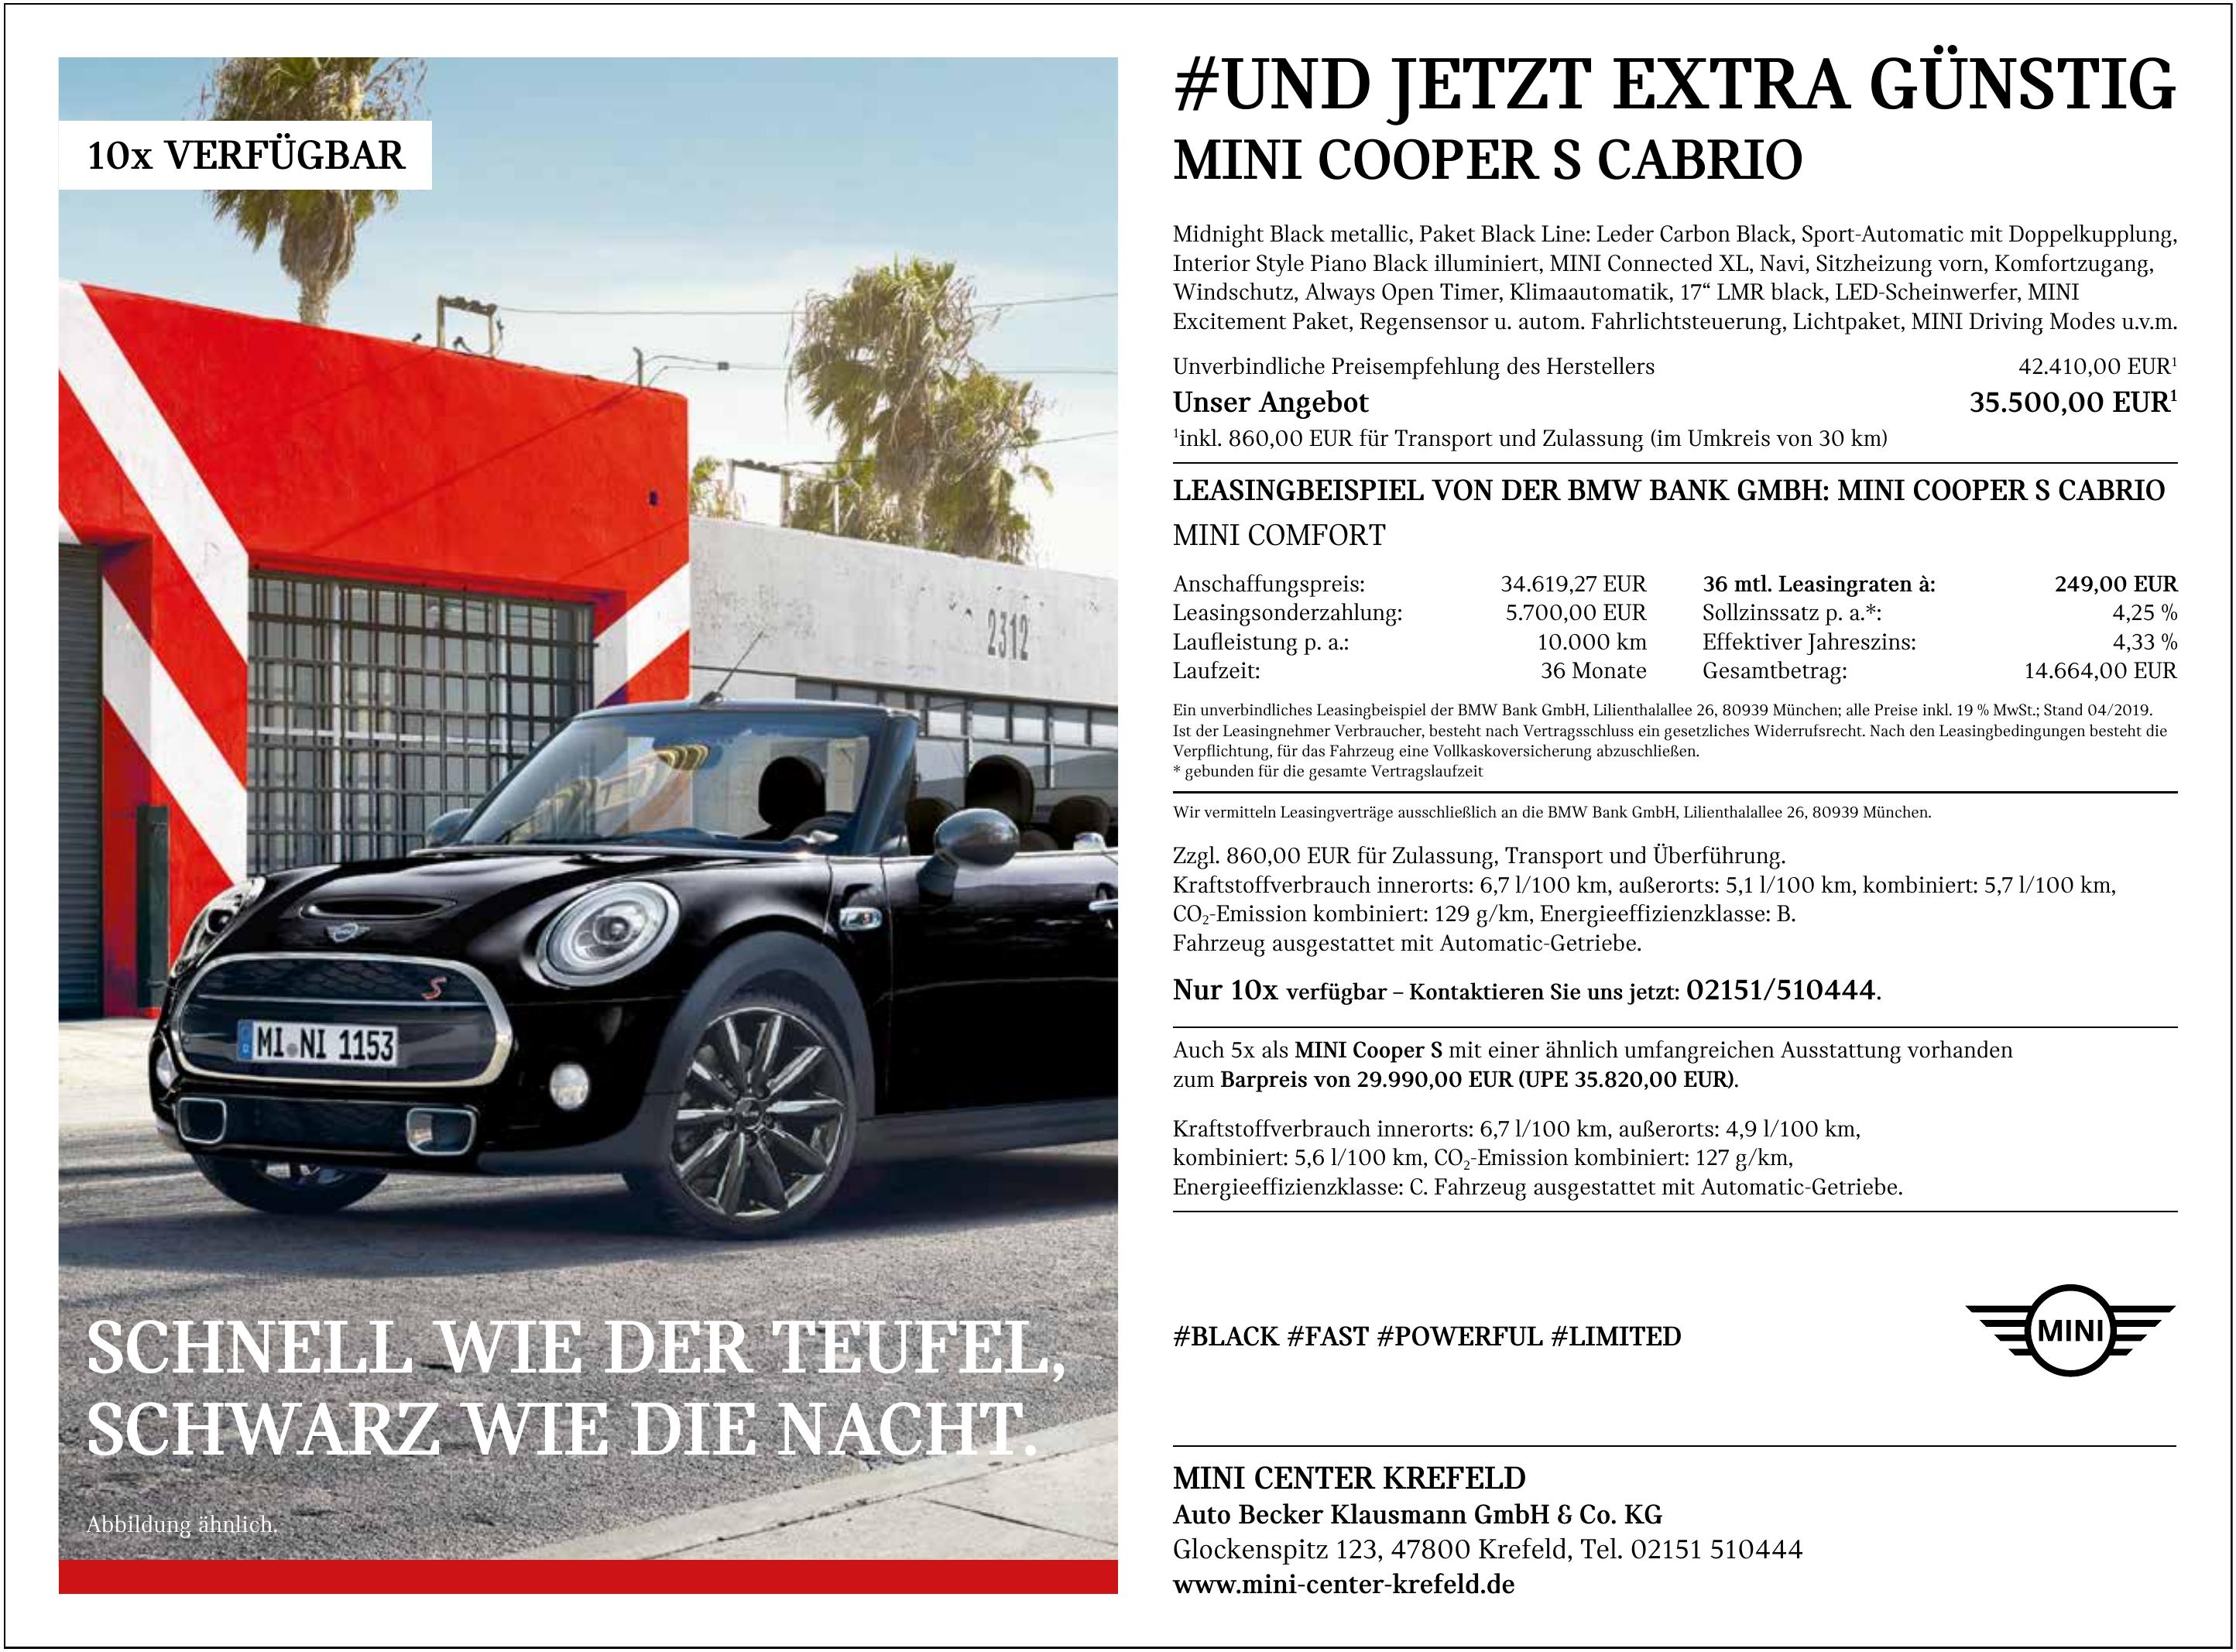 Auto Becker Klausmann GmbH & Co. KG